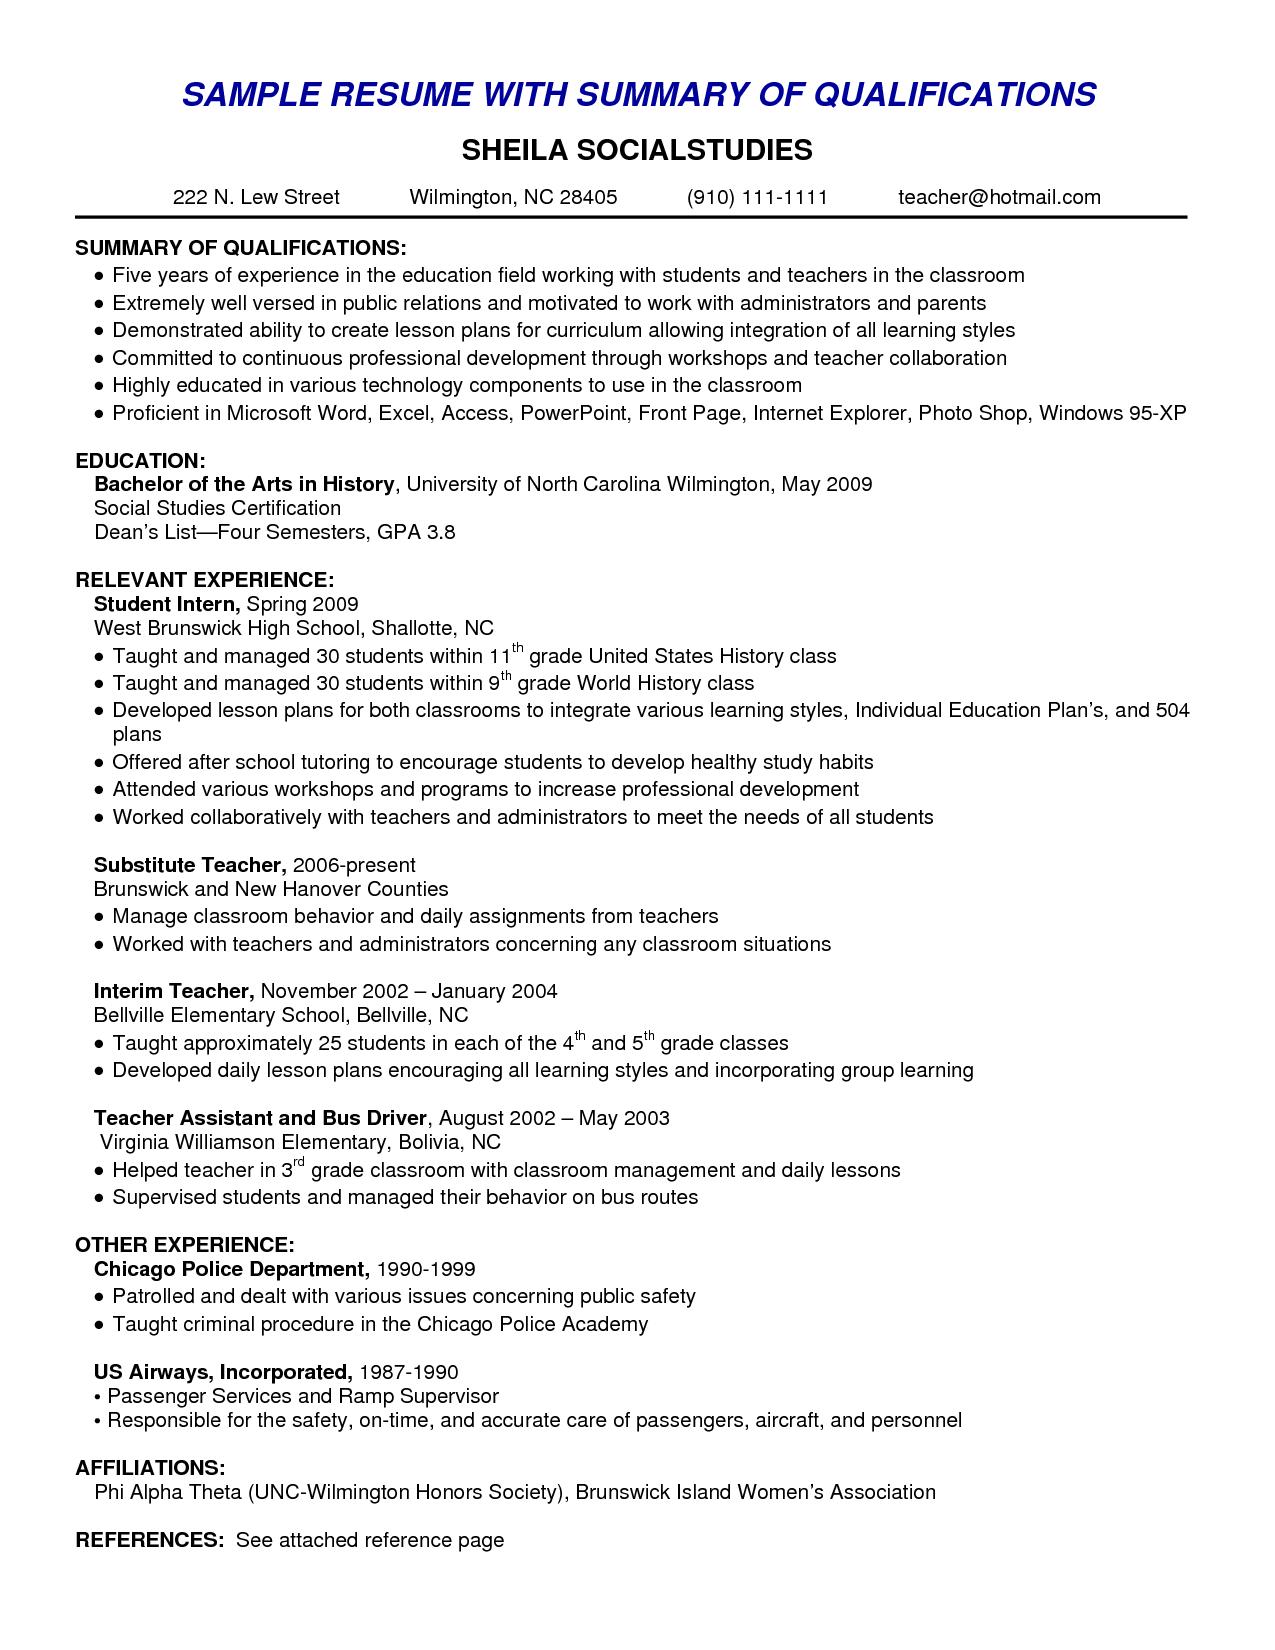 Resume Templates Qualifications , ResumeTemplates Good